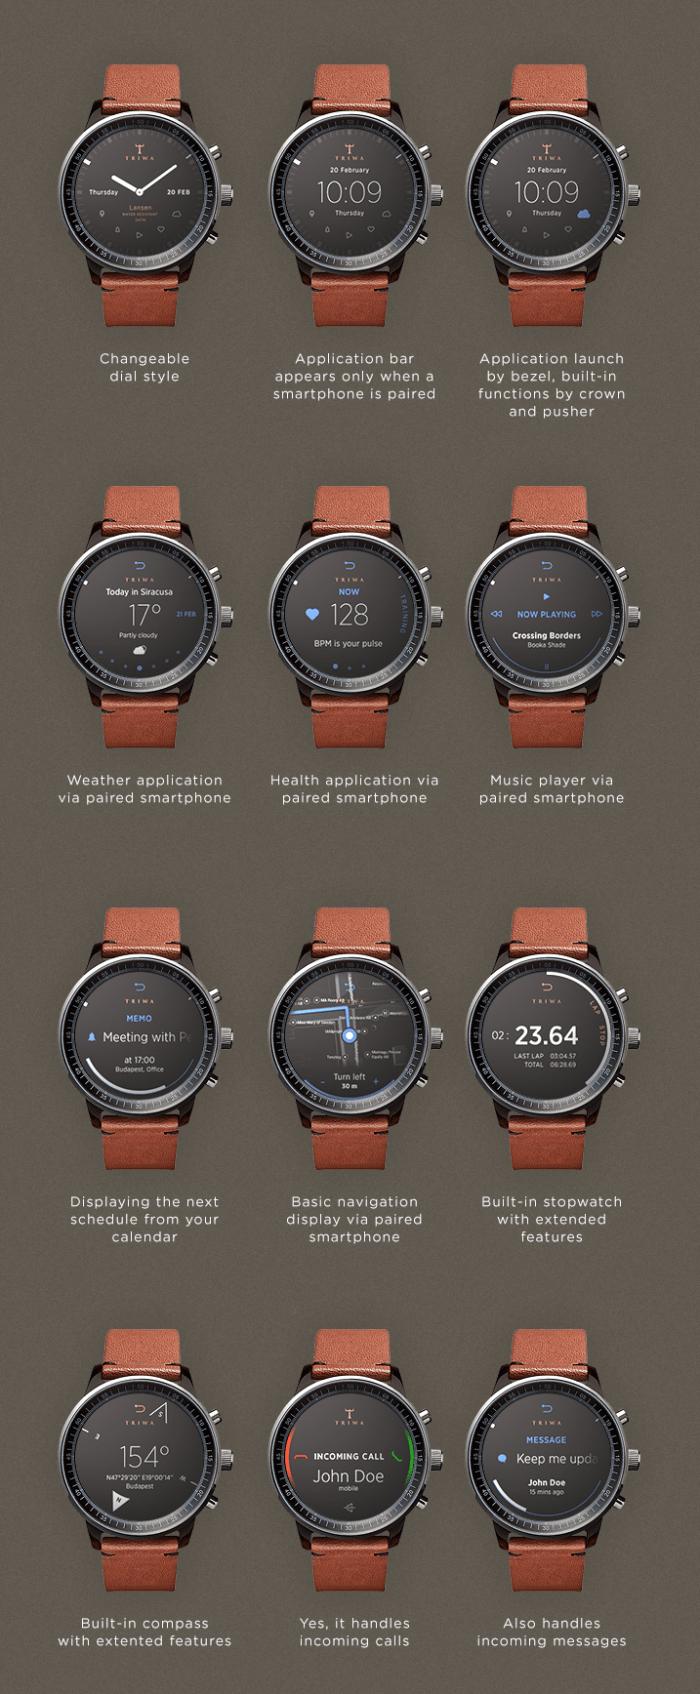 Smartwatch-concept-iwatch